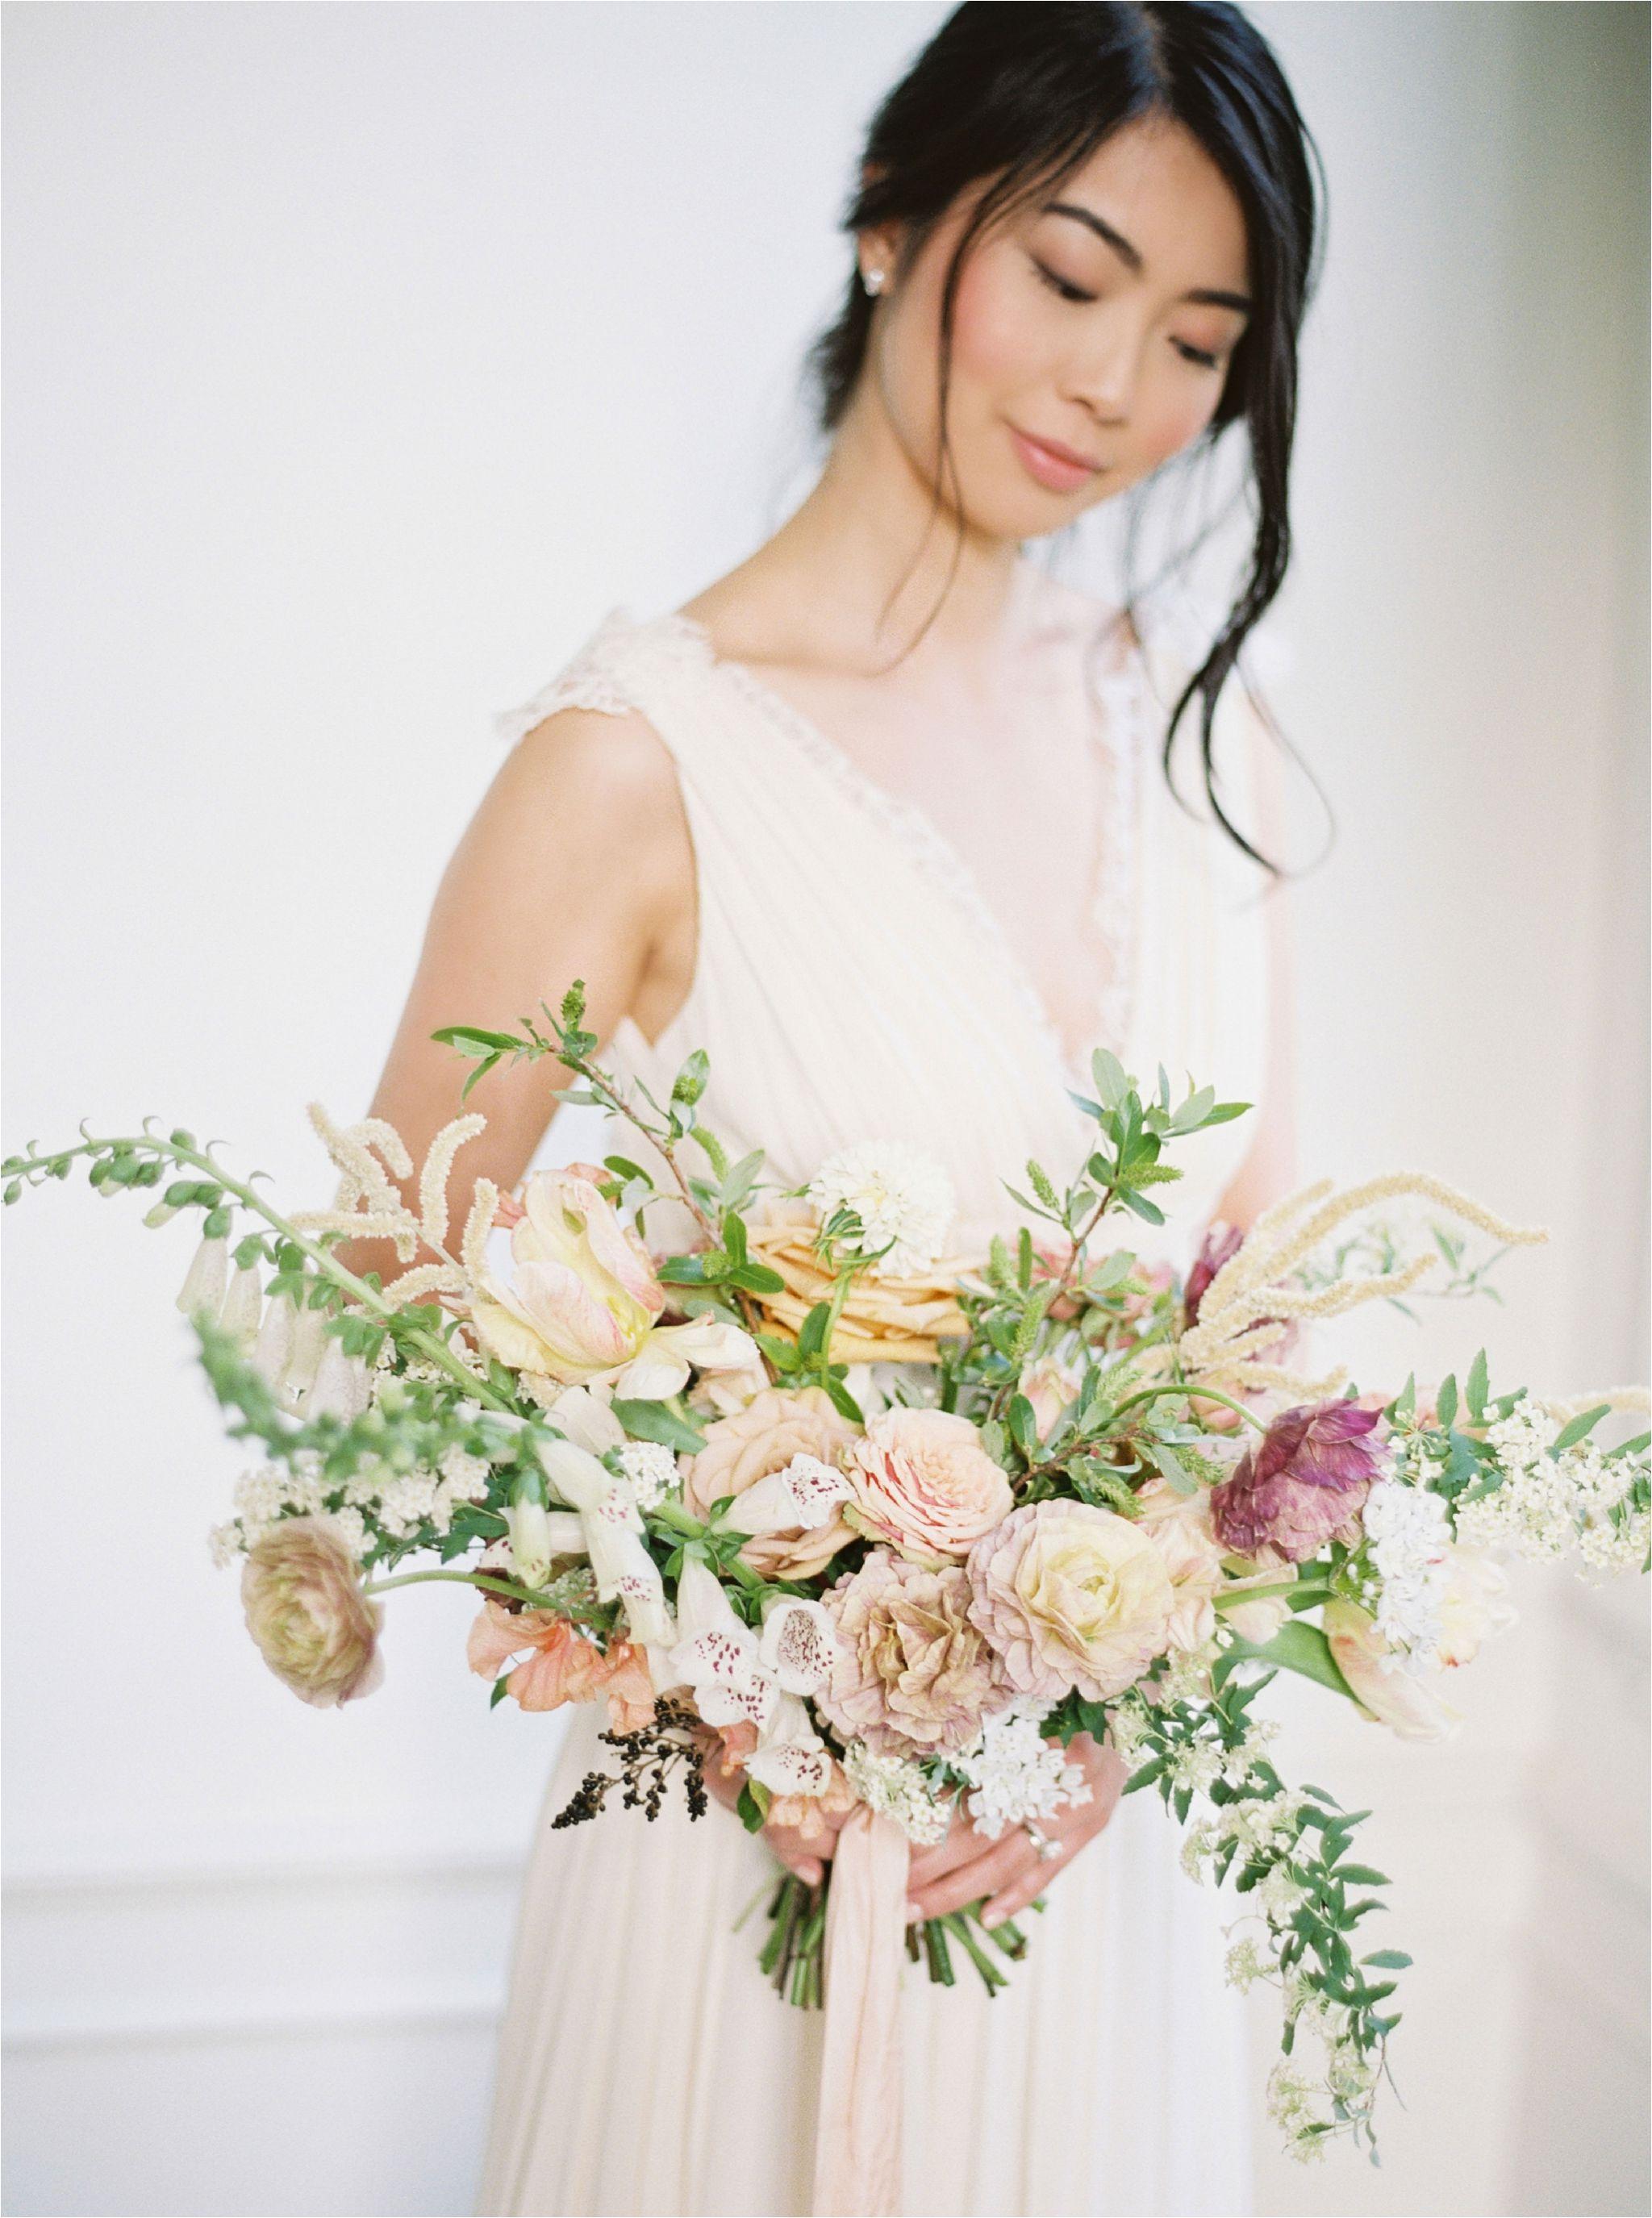 california_coast_mendicino_cuffeyscoveranch_wedding_elopement_photography00053.jpg